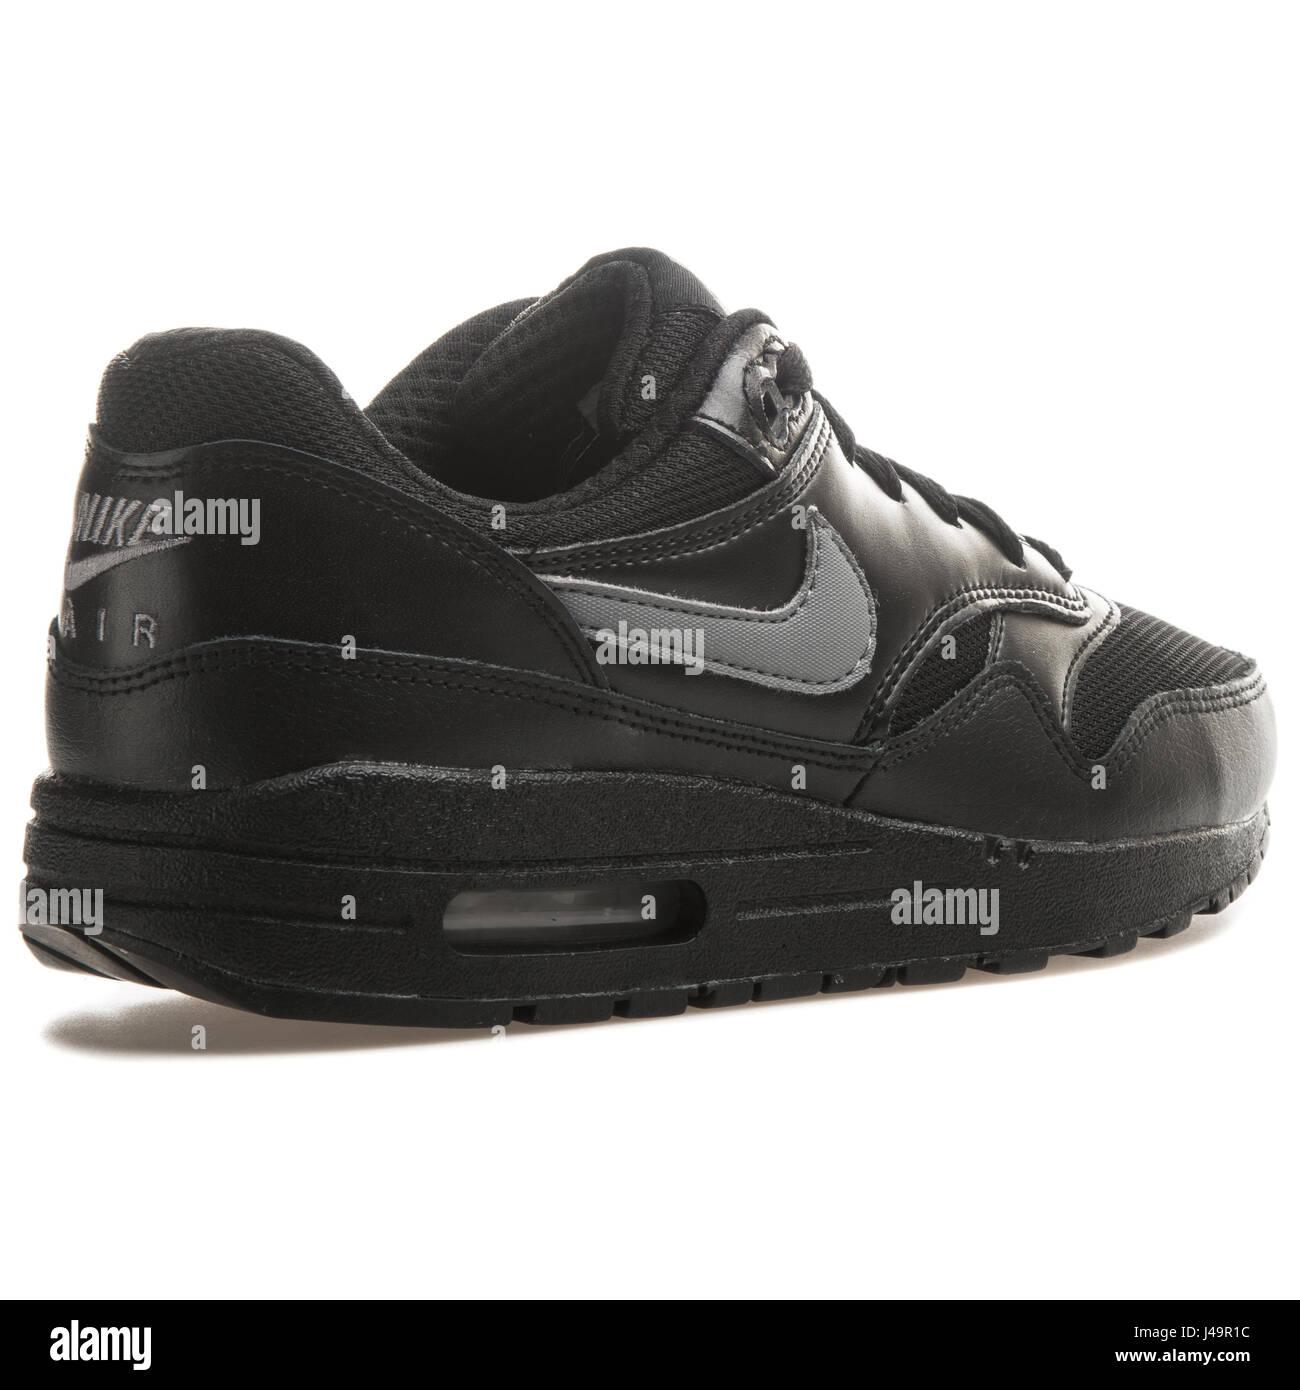 super popular a6533 1b8ce Nike Air Max 1 (GS) Black - 555766-043 - Stock Image